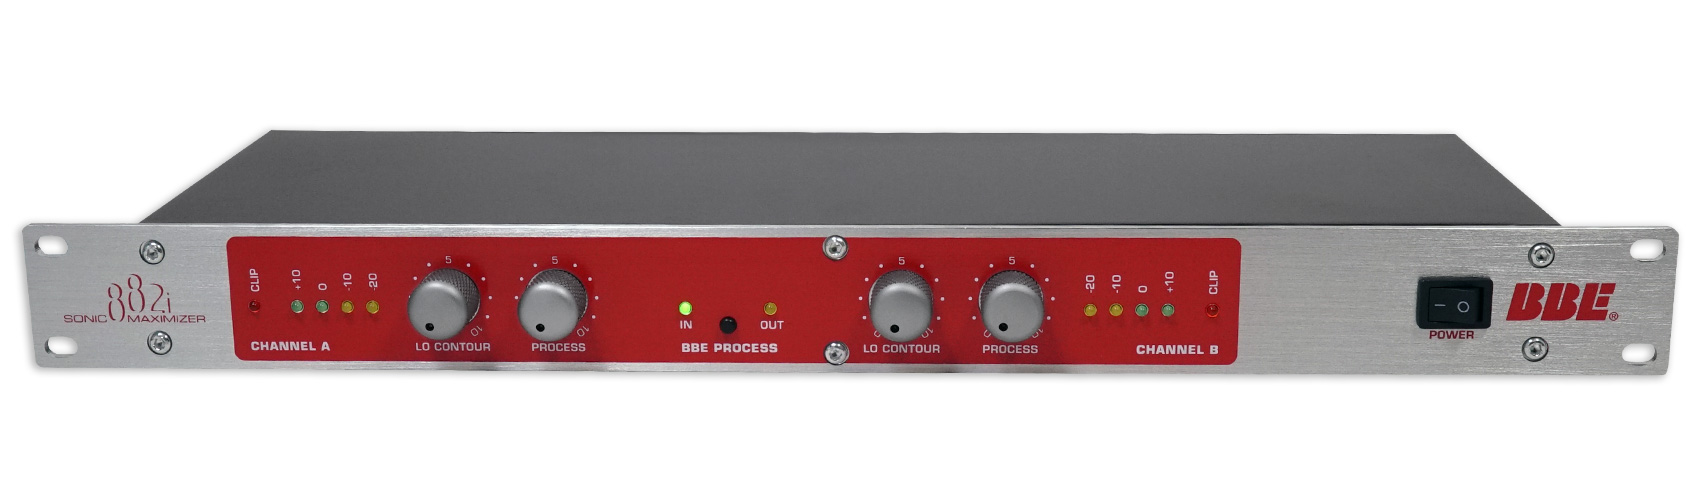 BBE 882I Professional Rack Mount Studio Sonic Maximizer Signal Sound Processor by BBE